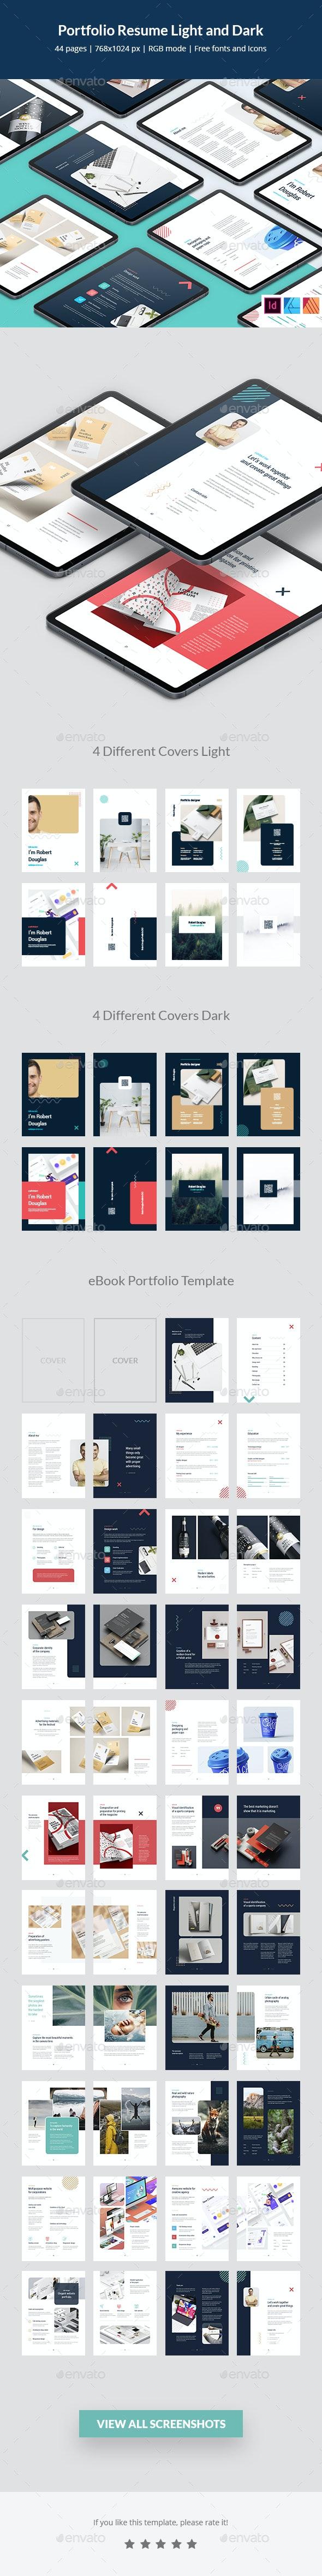 Portfolio Resume Light and Dark eBook - Digital Books ePublishing